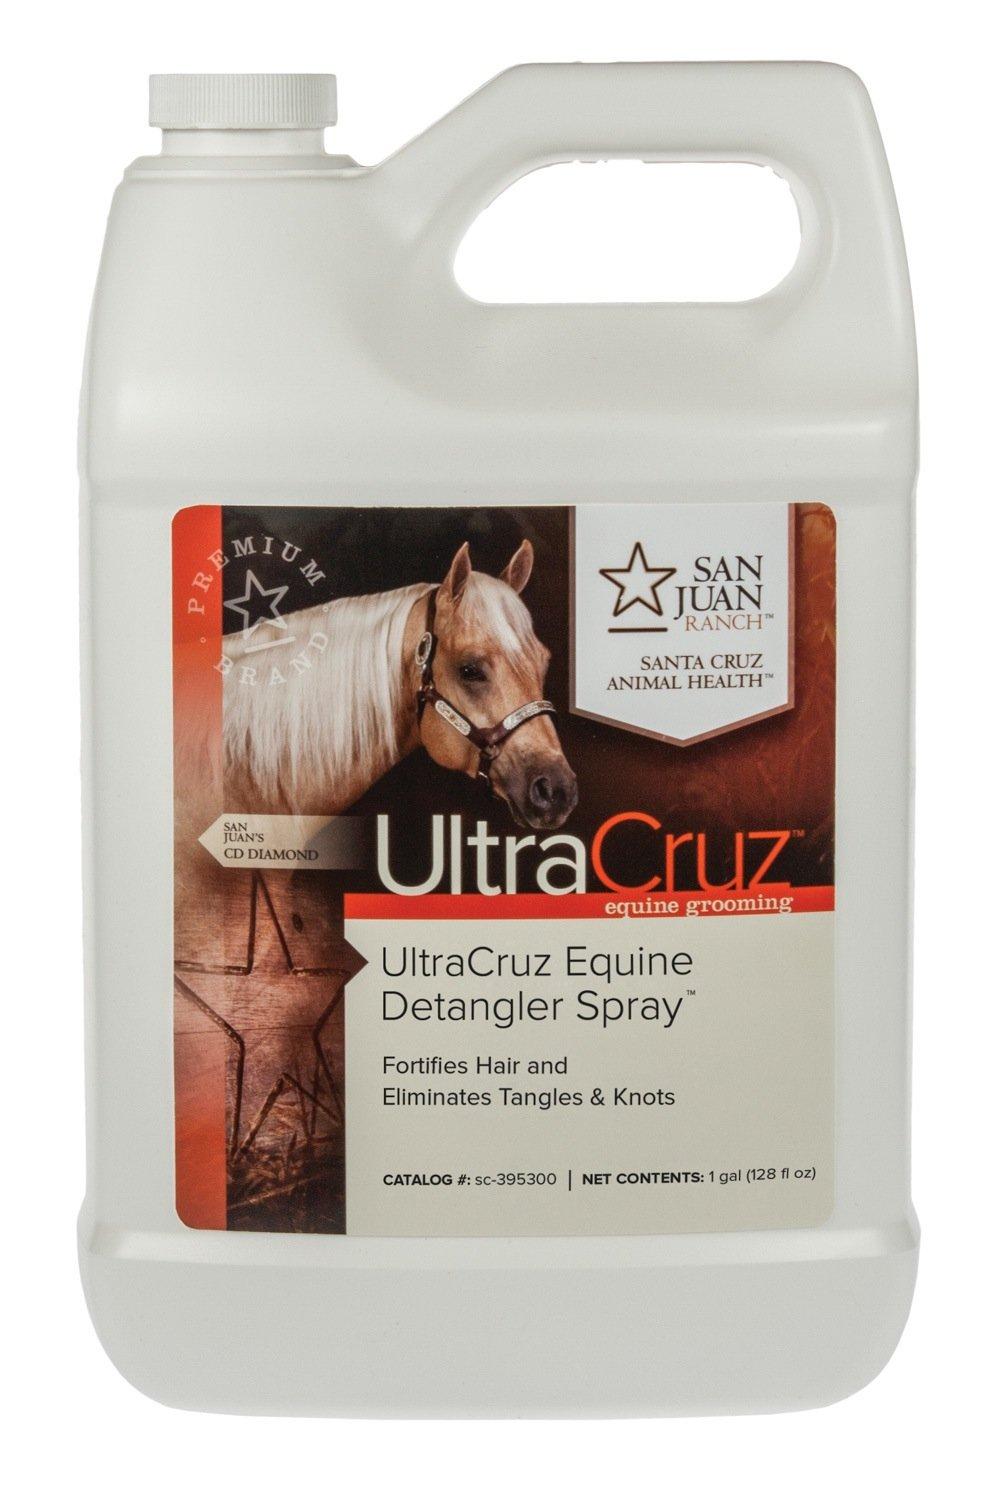 UltraCruz Equine Detangler Spray for Horses, 1 gal Santa Cruz Animal Health sc-395300